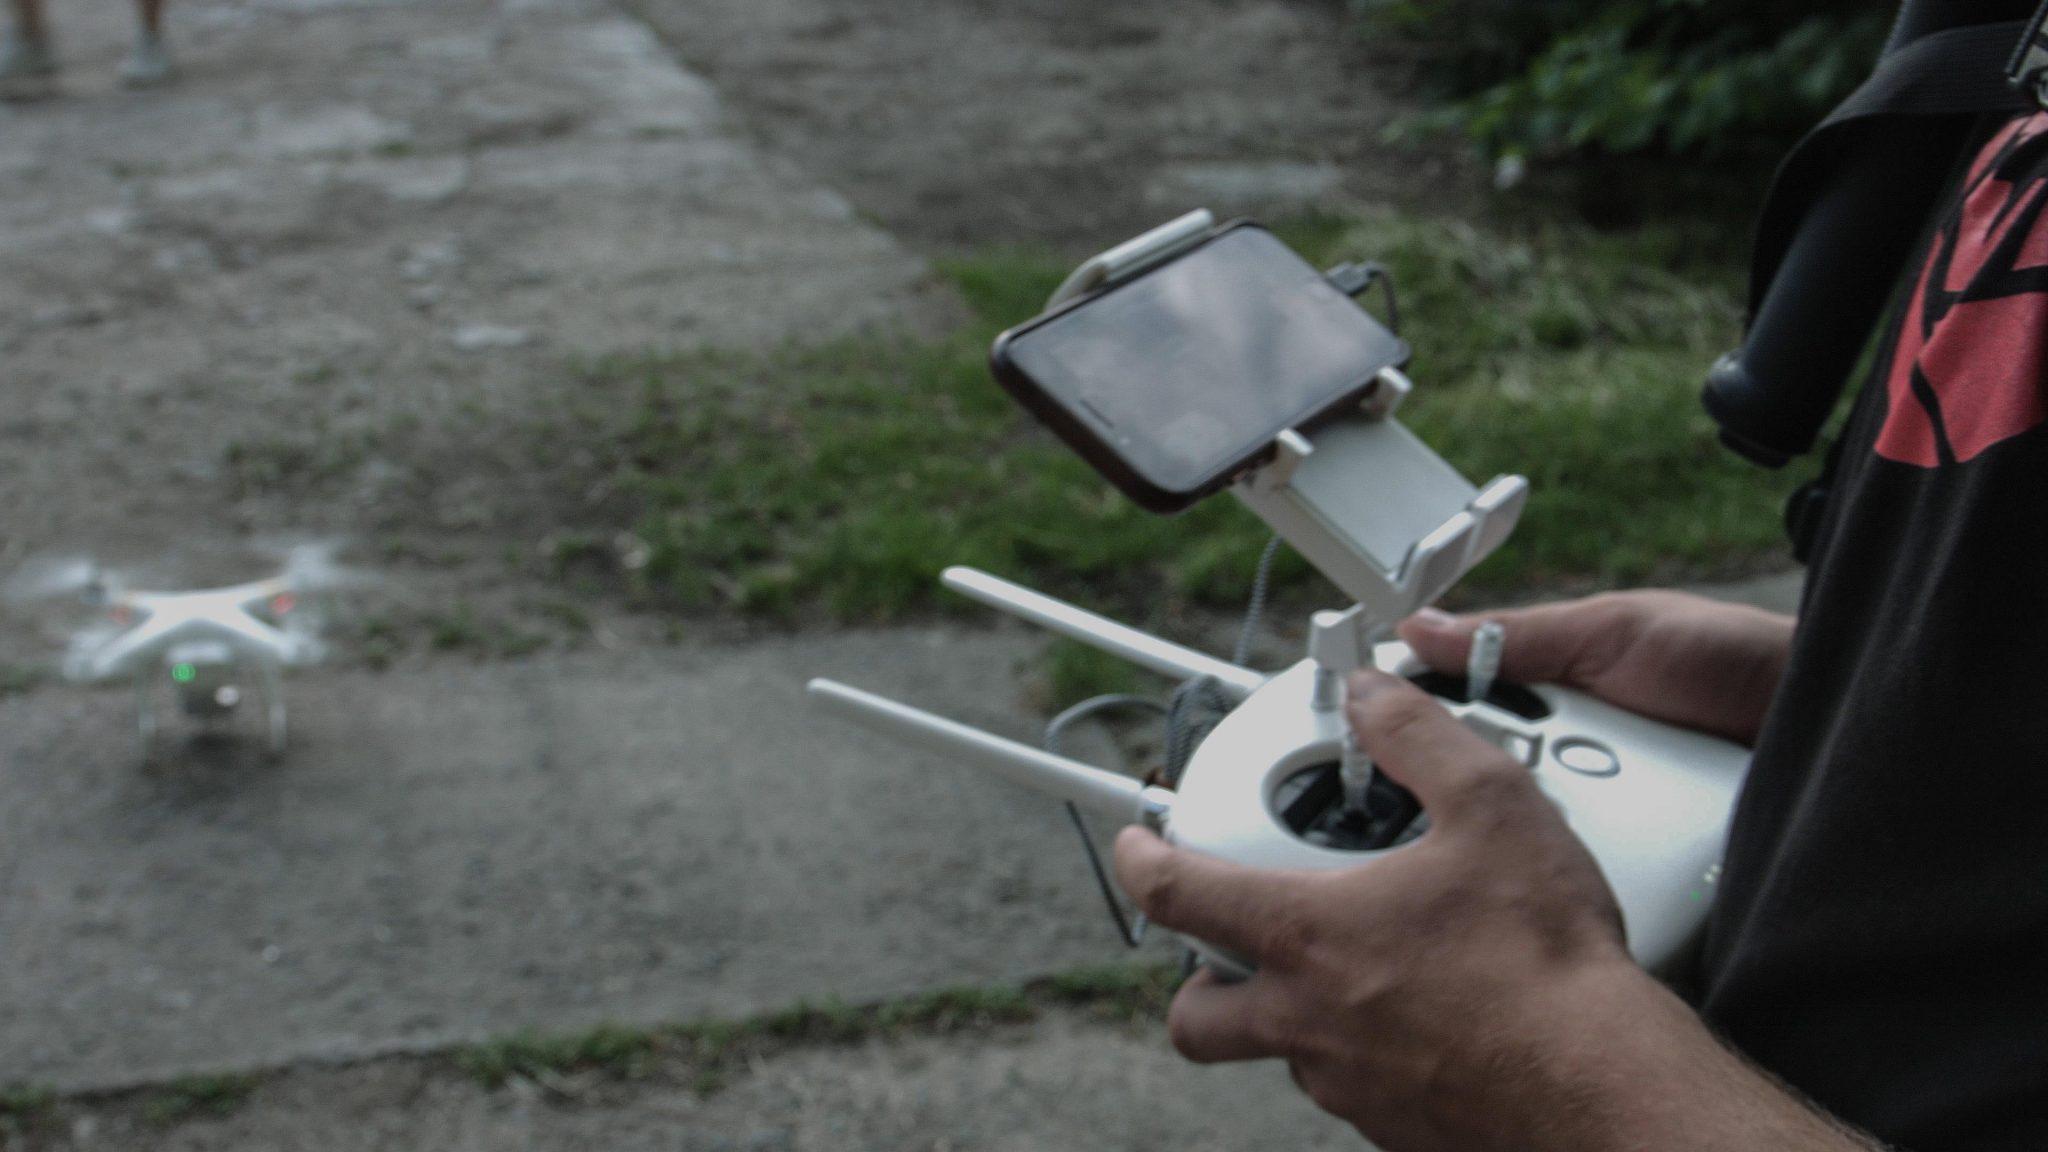 Vzlet dronu Phantom 3 Pro